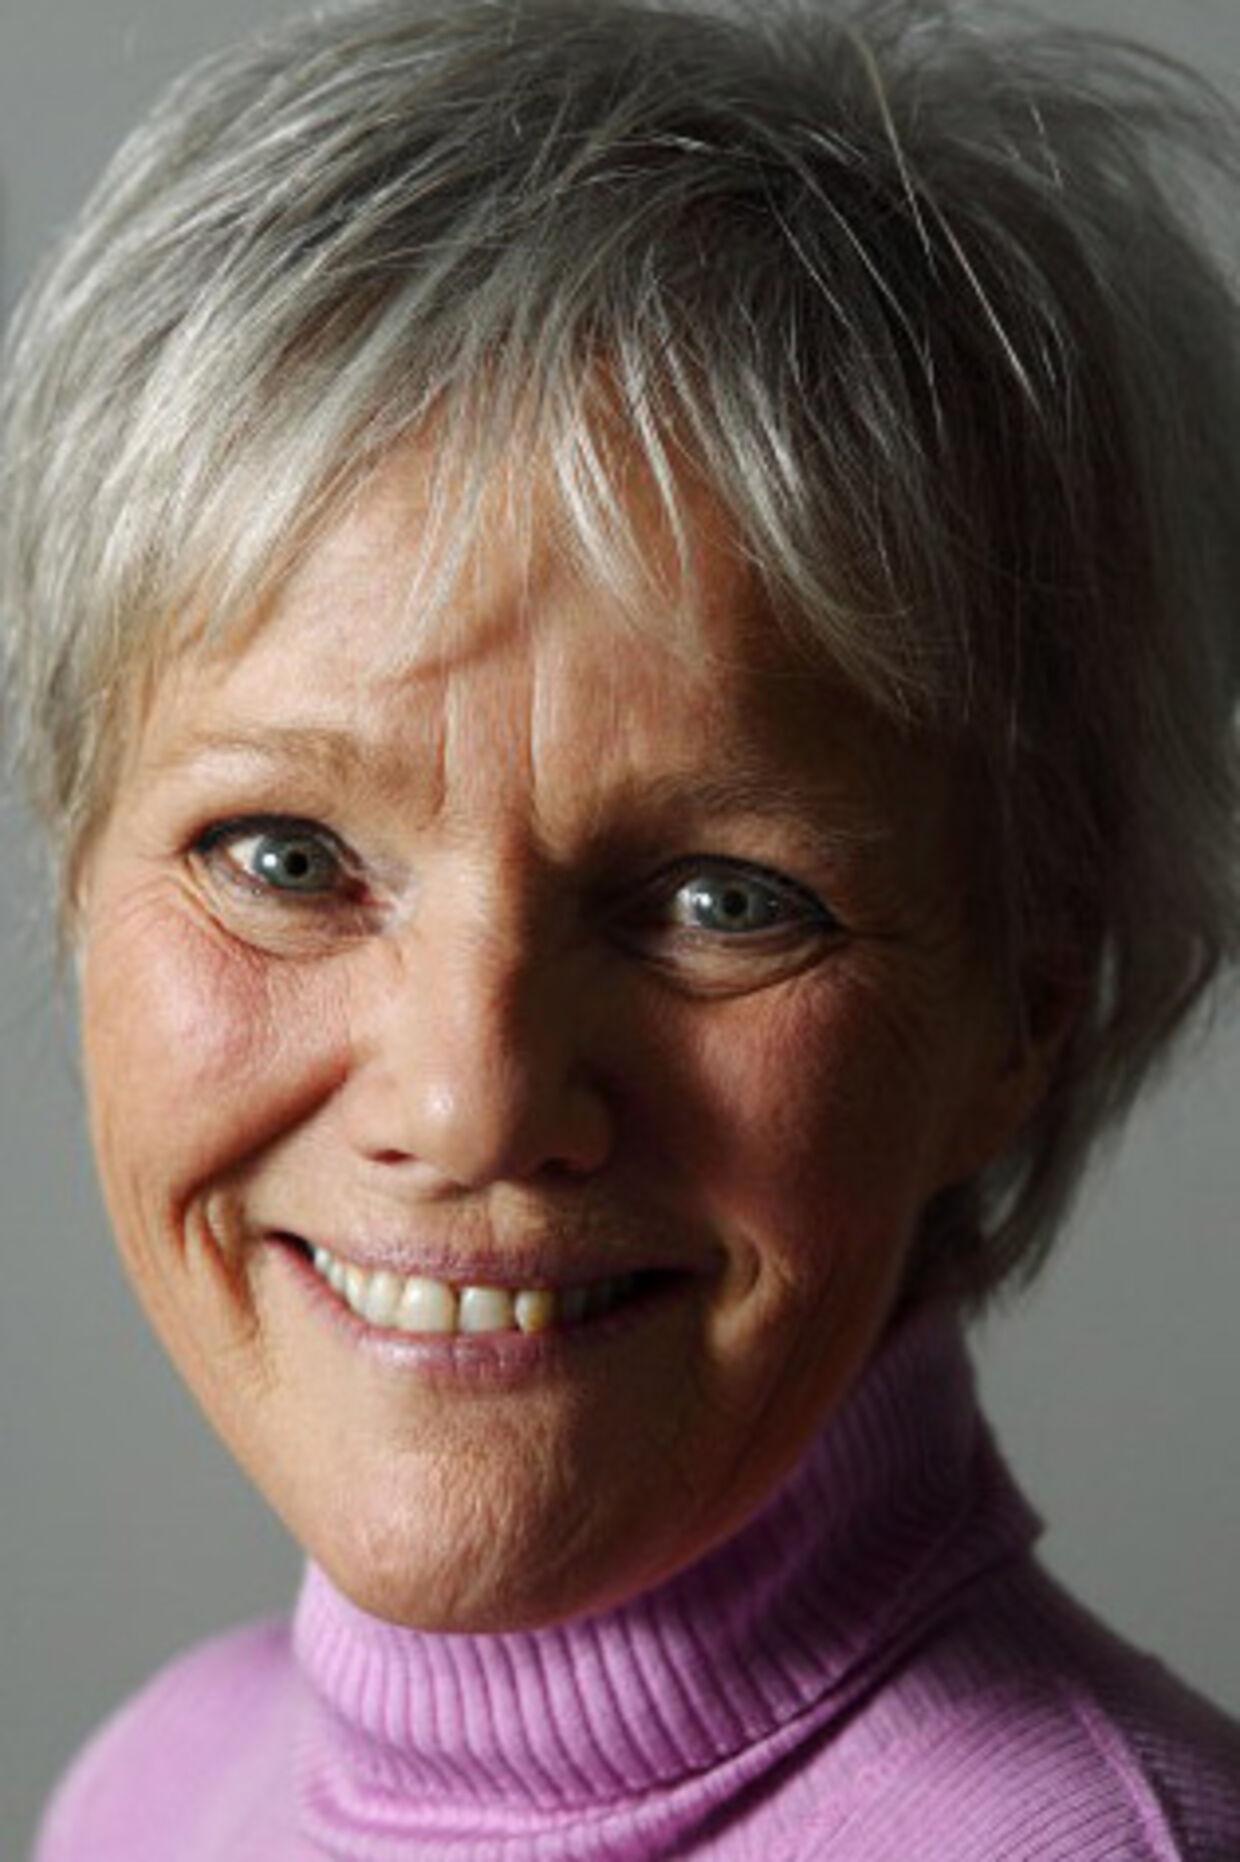 Karen Jespersen er tilsyneladende meget velkommen i Venstre. Foto: Claus Bech Andersen